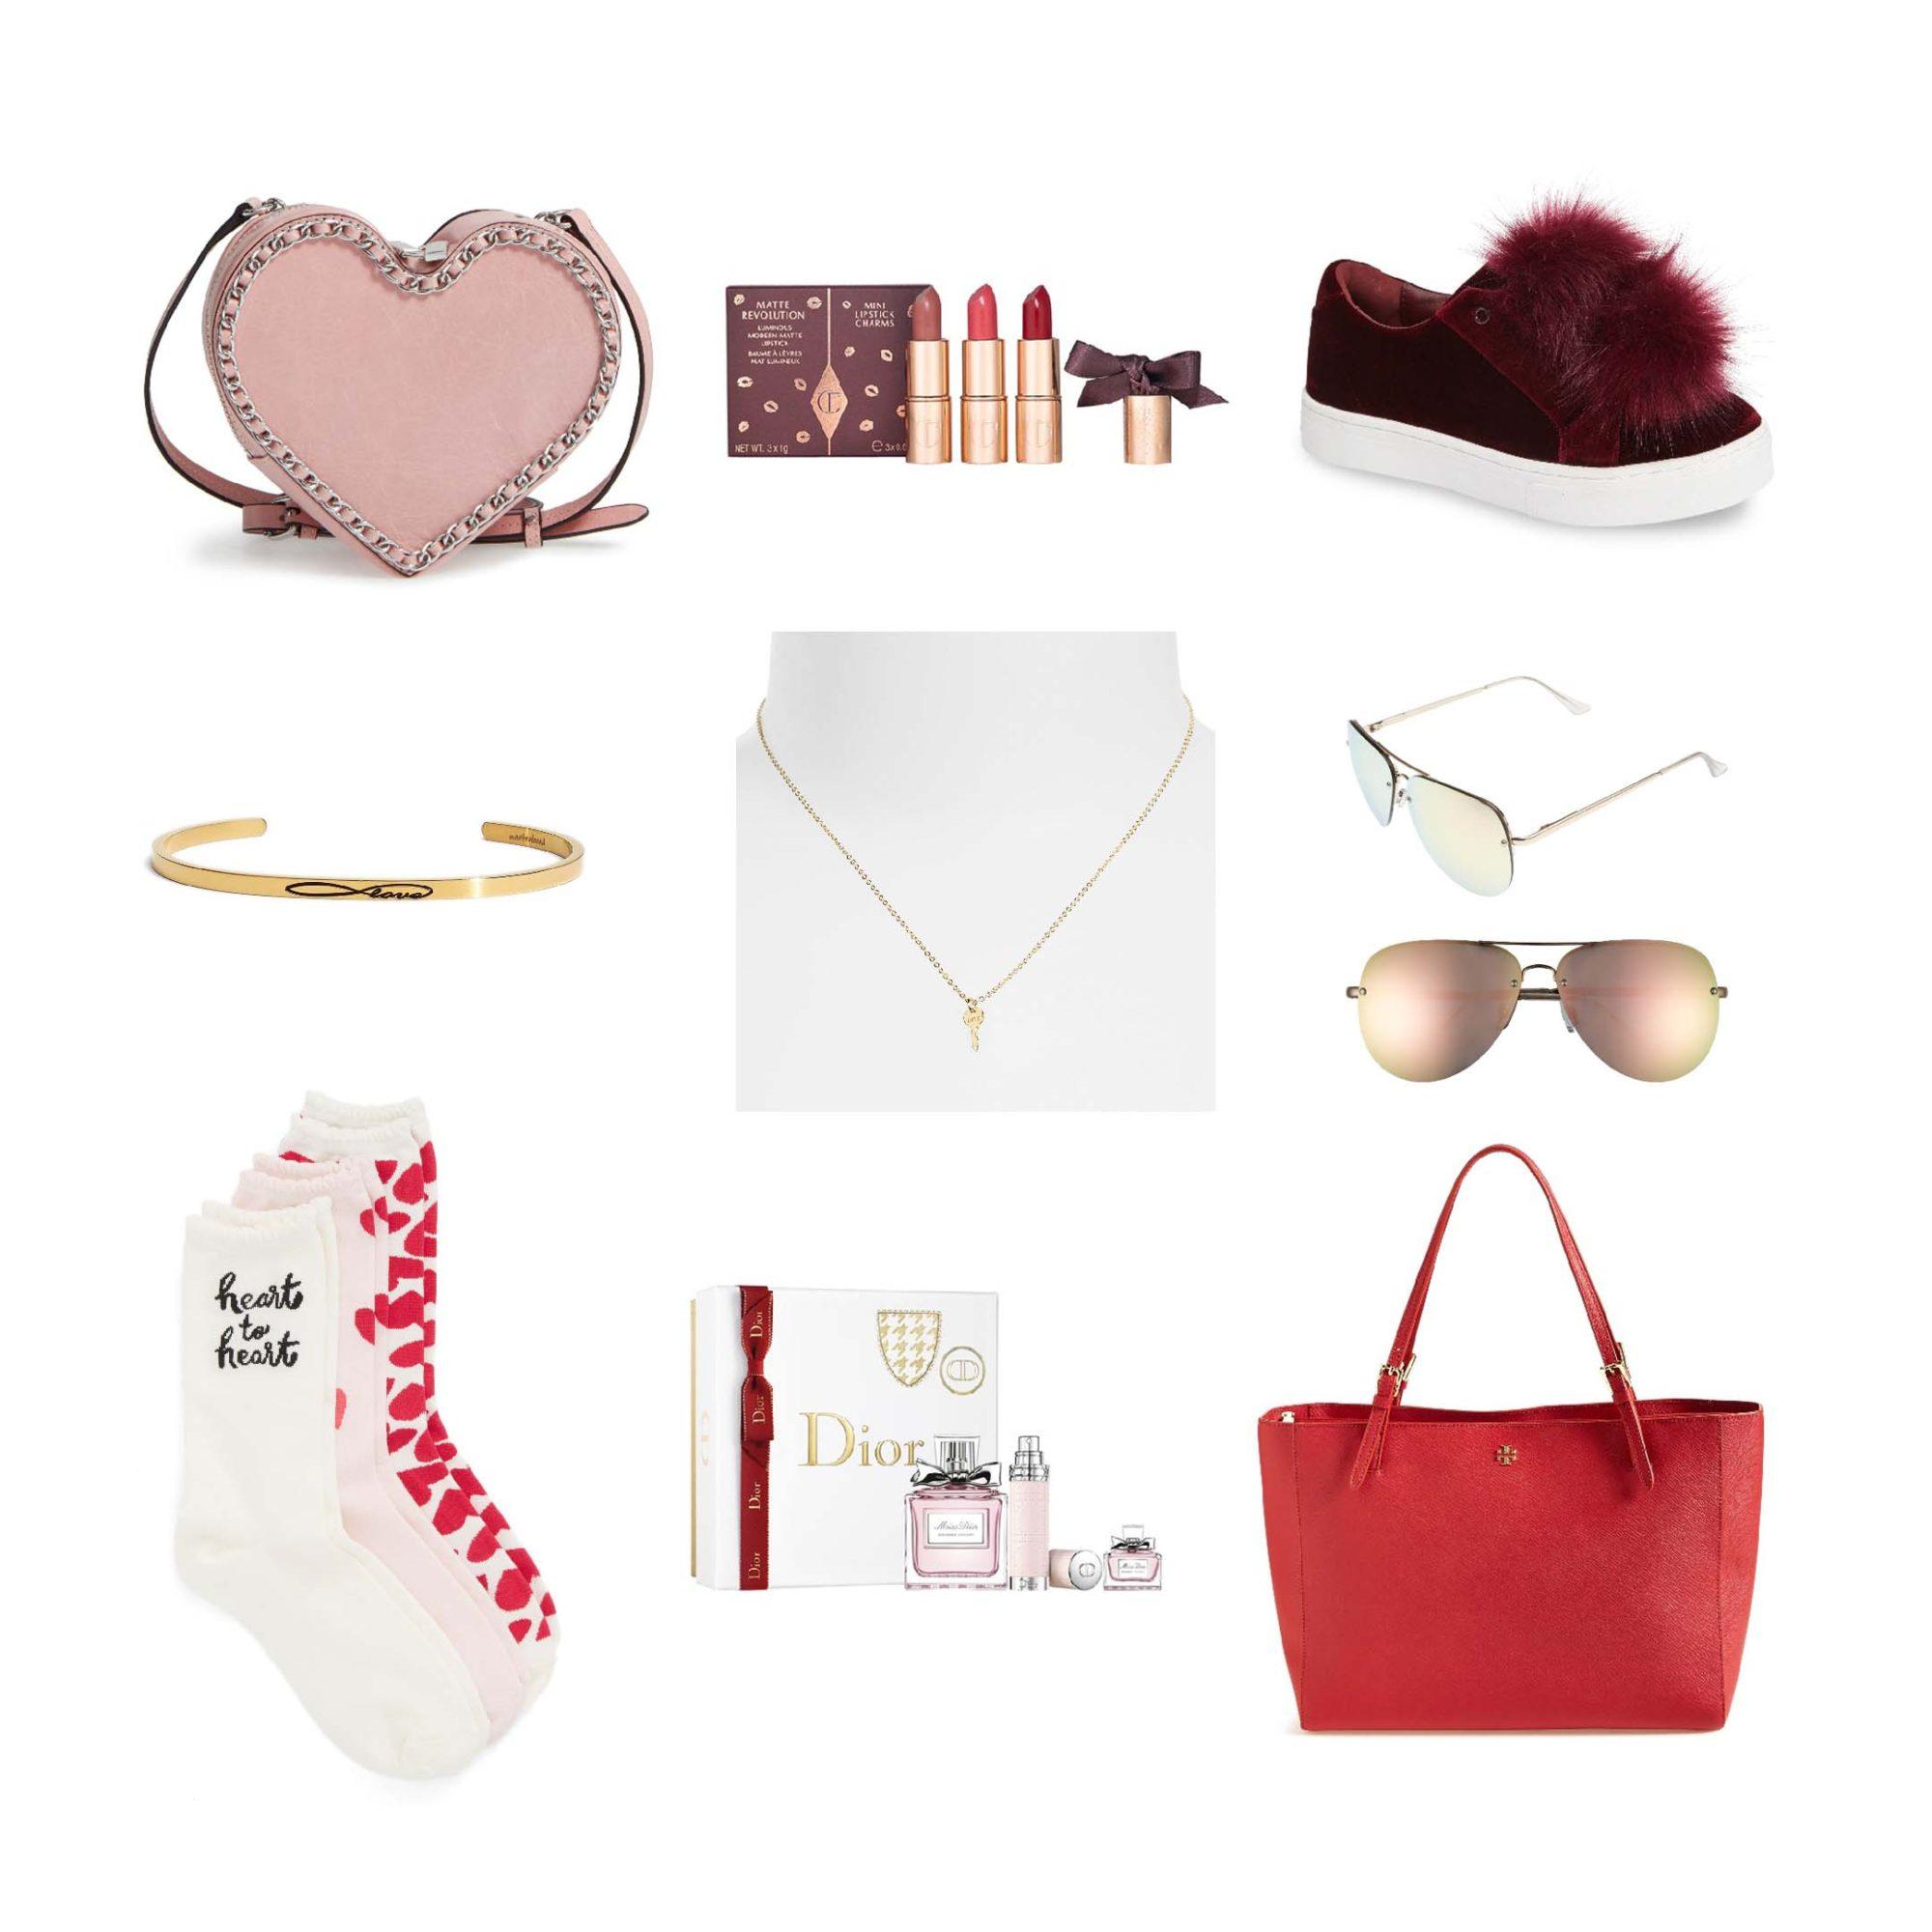 Wishlist Wednesday: Valentine's Day Gifts